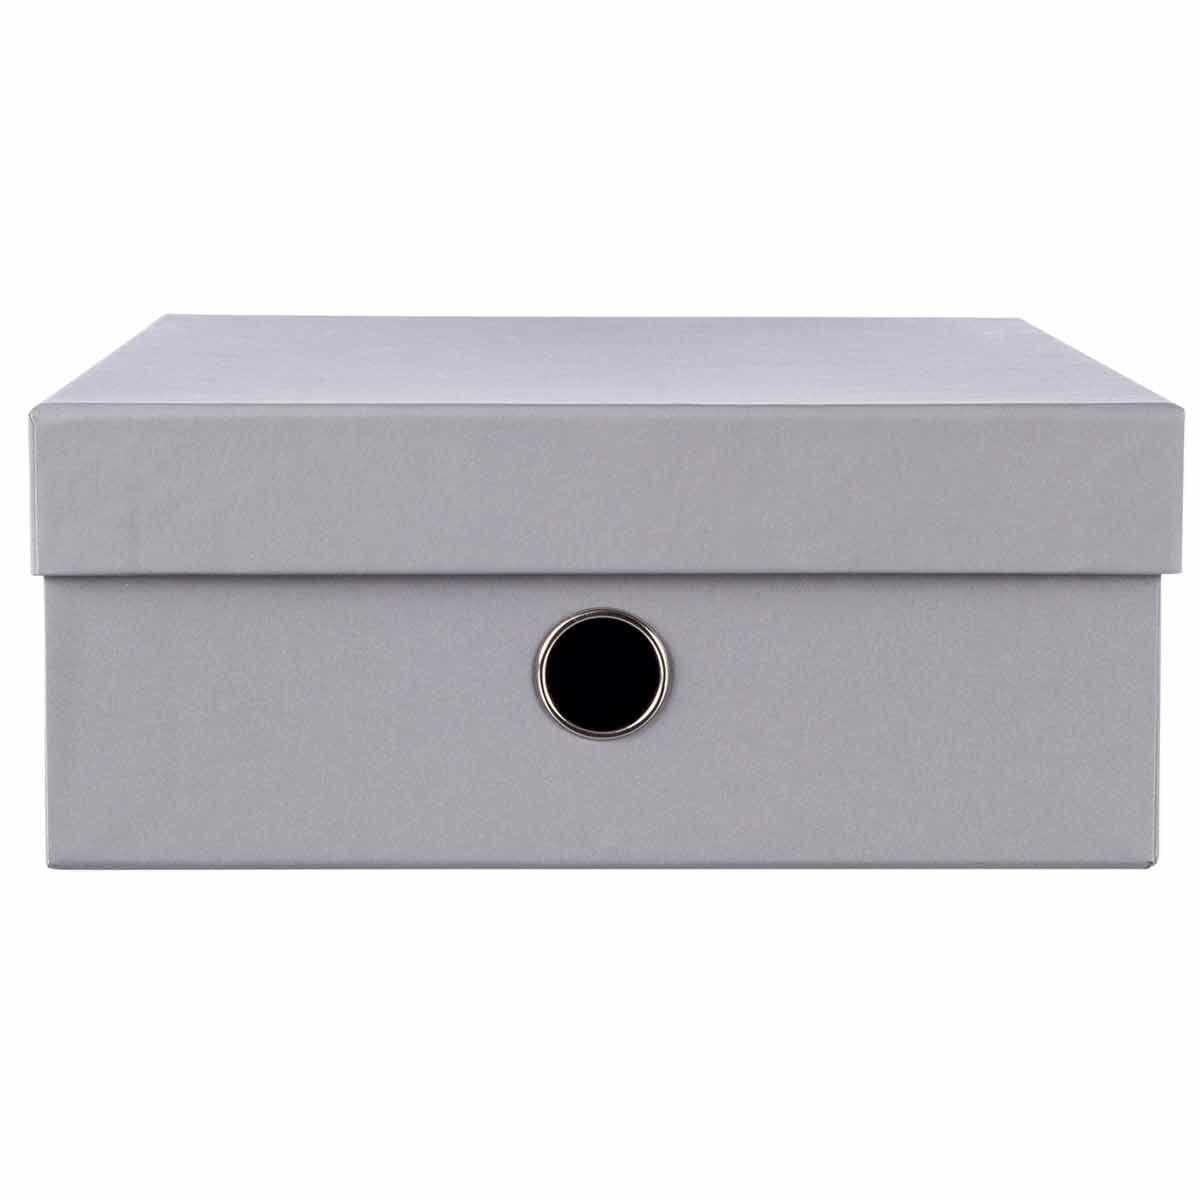 Ryman Pastel Storage Box A4